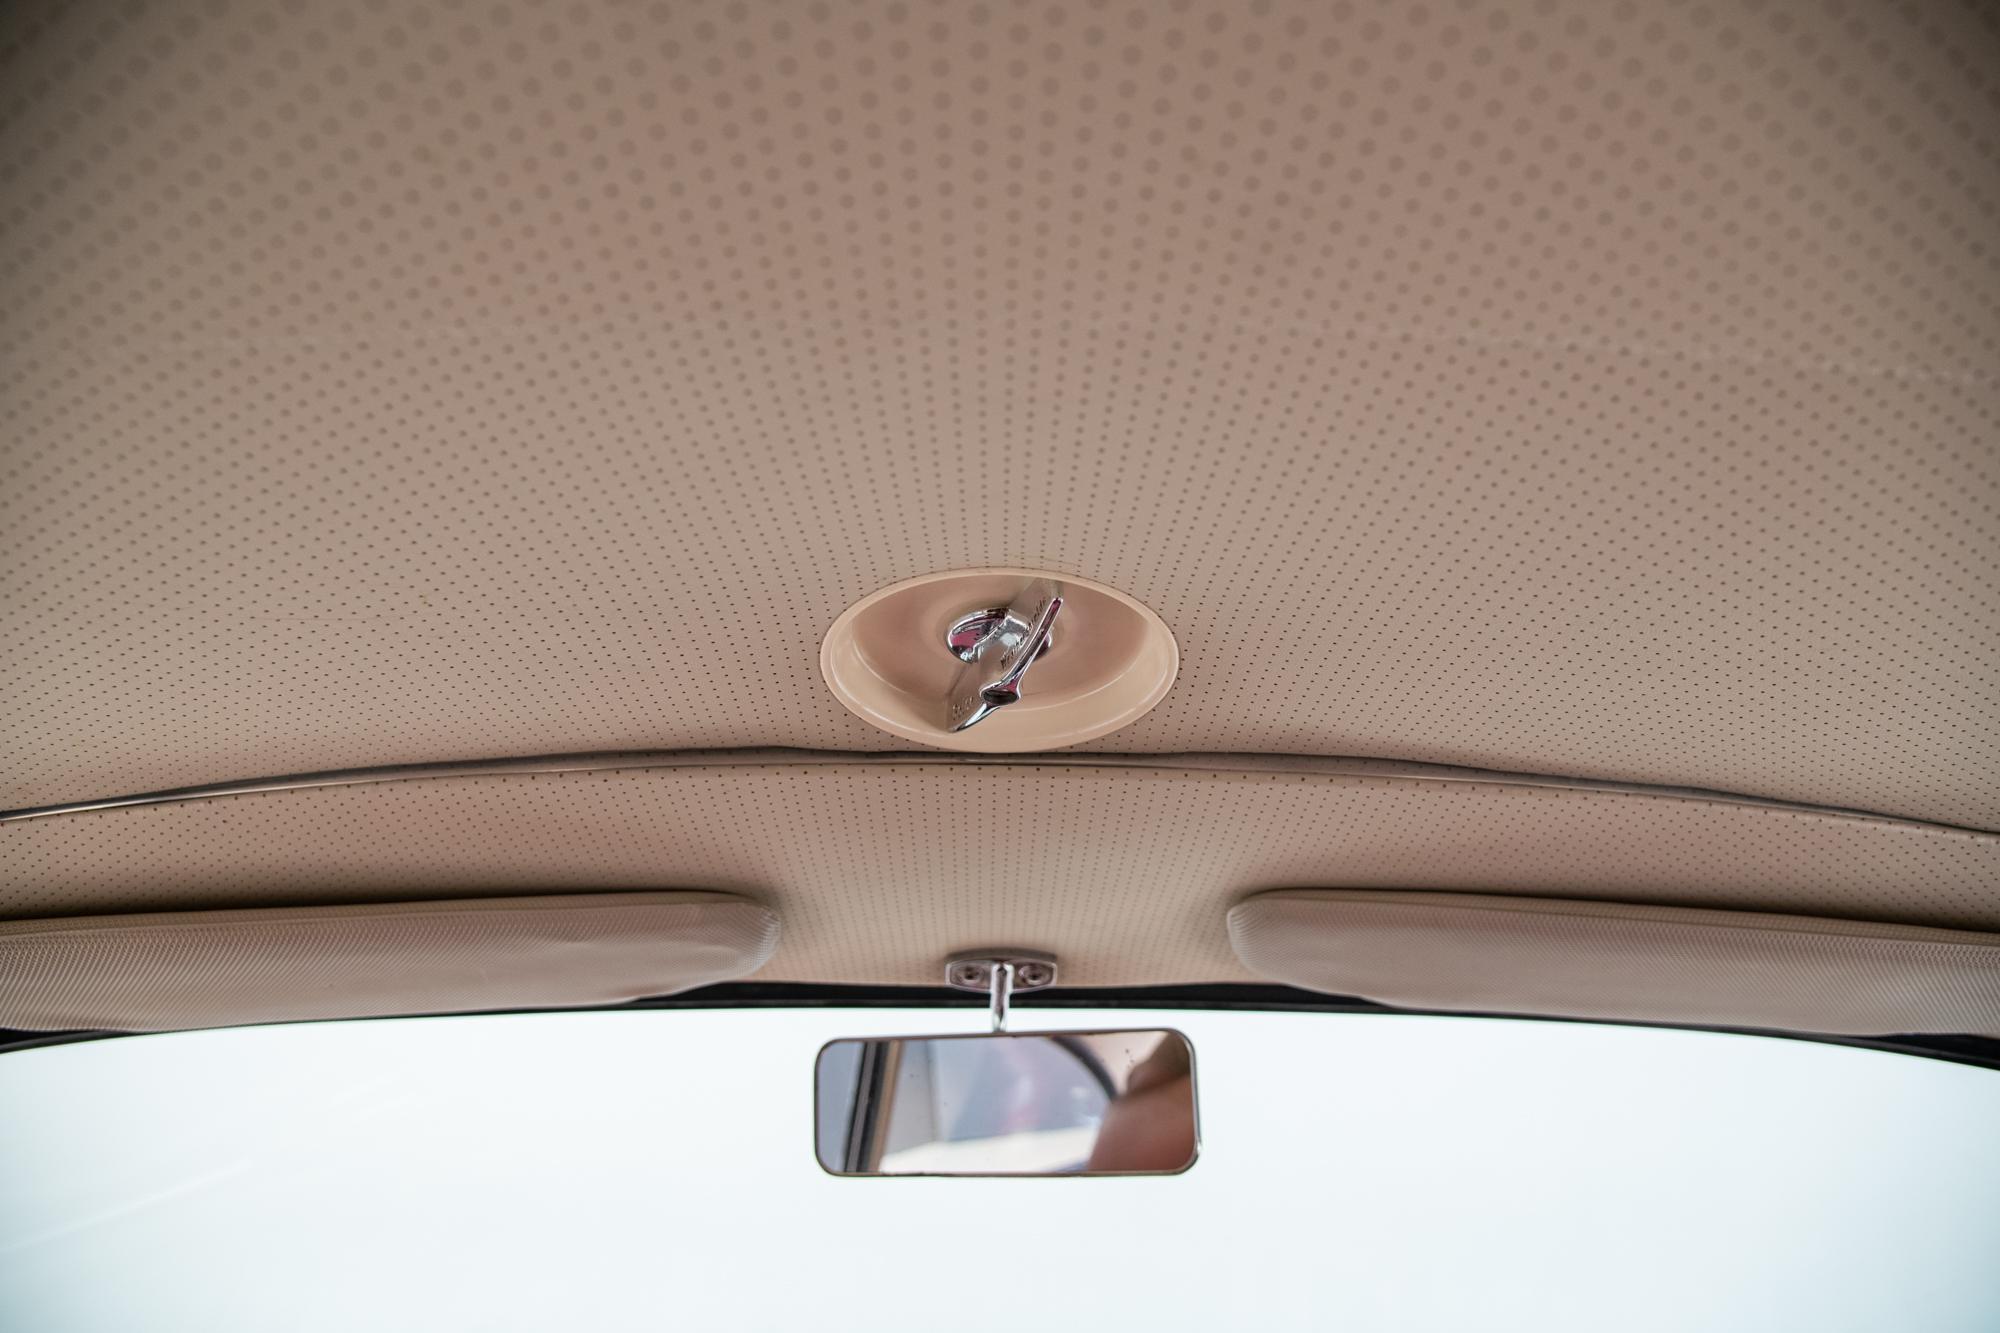 1958 Porsche 356A Super , IVORY, VIN 101893, MILEAGE 29904